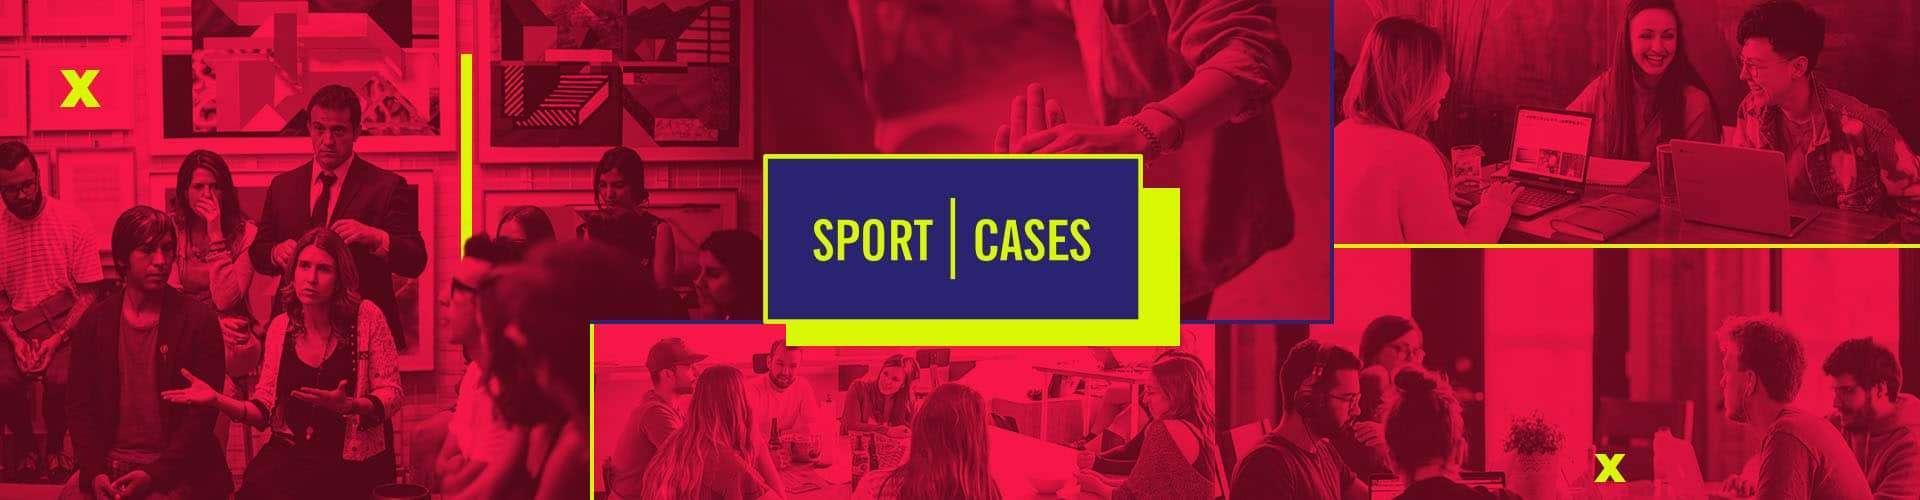 Motivación Sport Cases